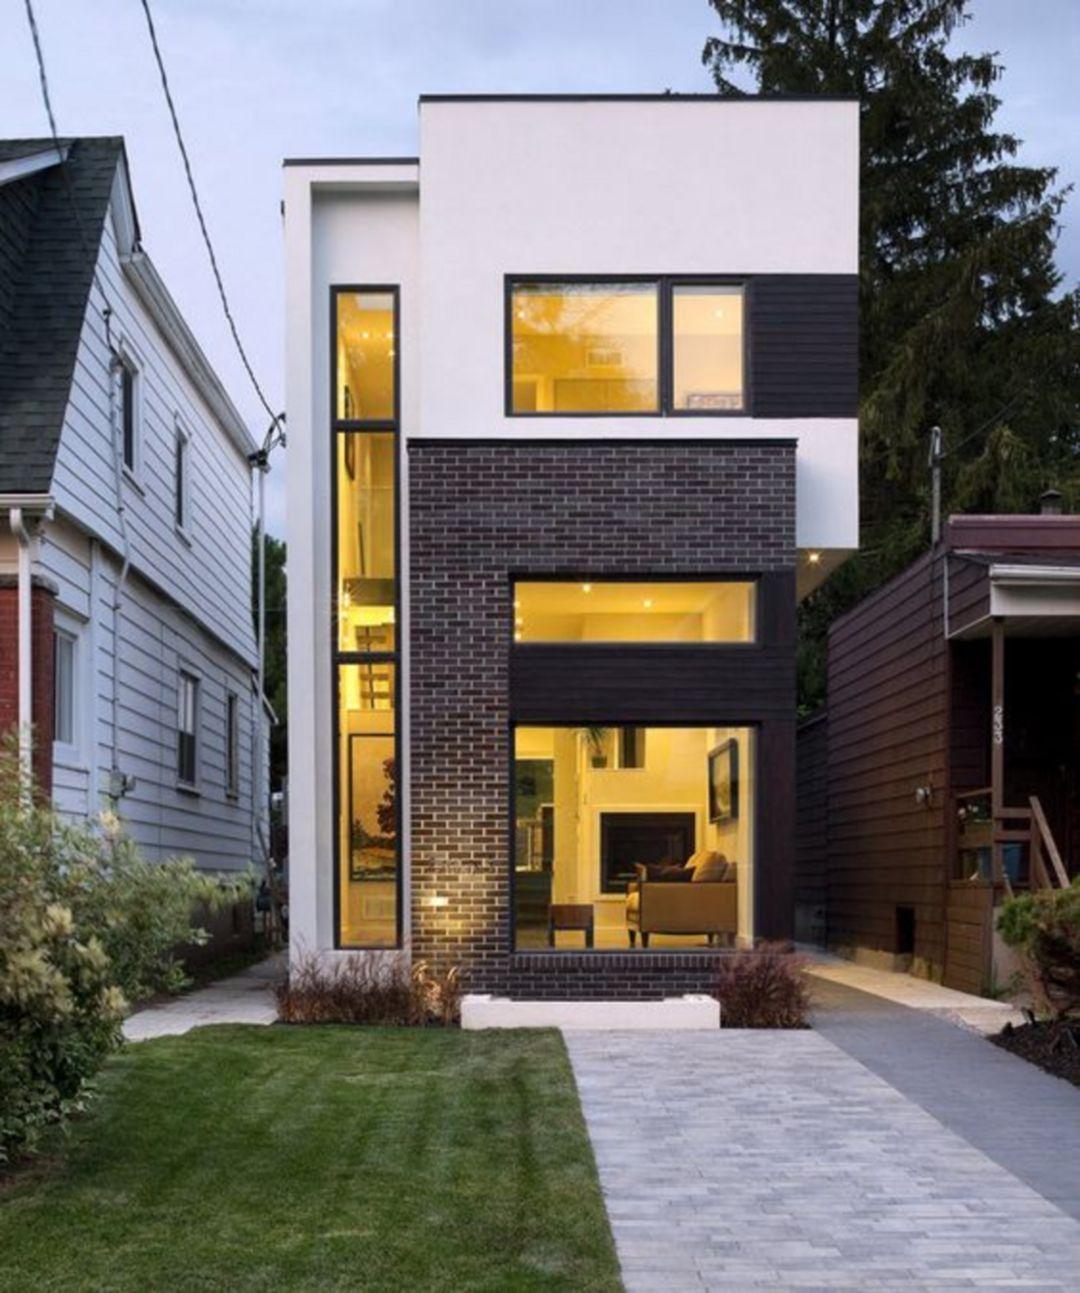 20 Best Of Minimalist House Designs Simple Unique And Modern Small House Design Minimalist House Design Tiny House Design